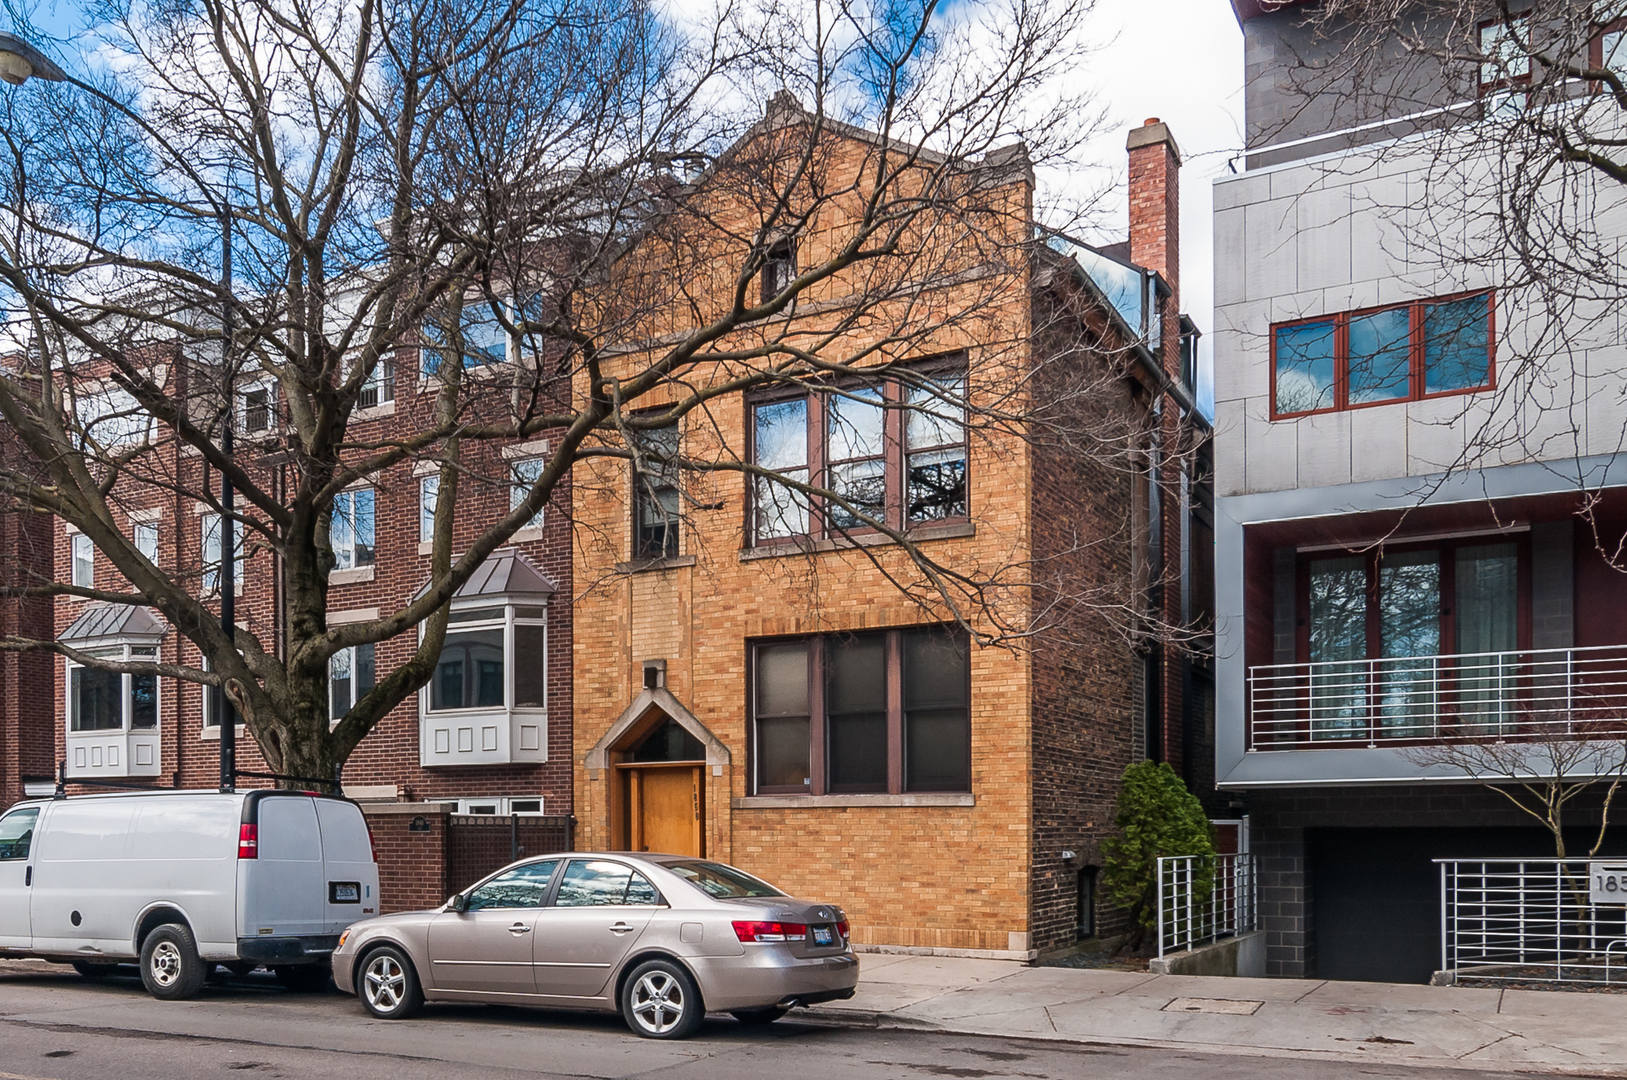 1850 N sedgwick Exterior Photo